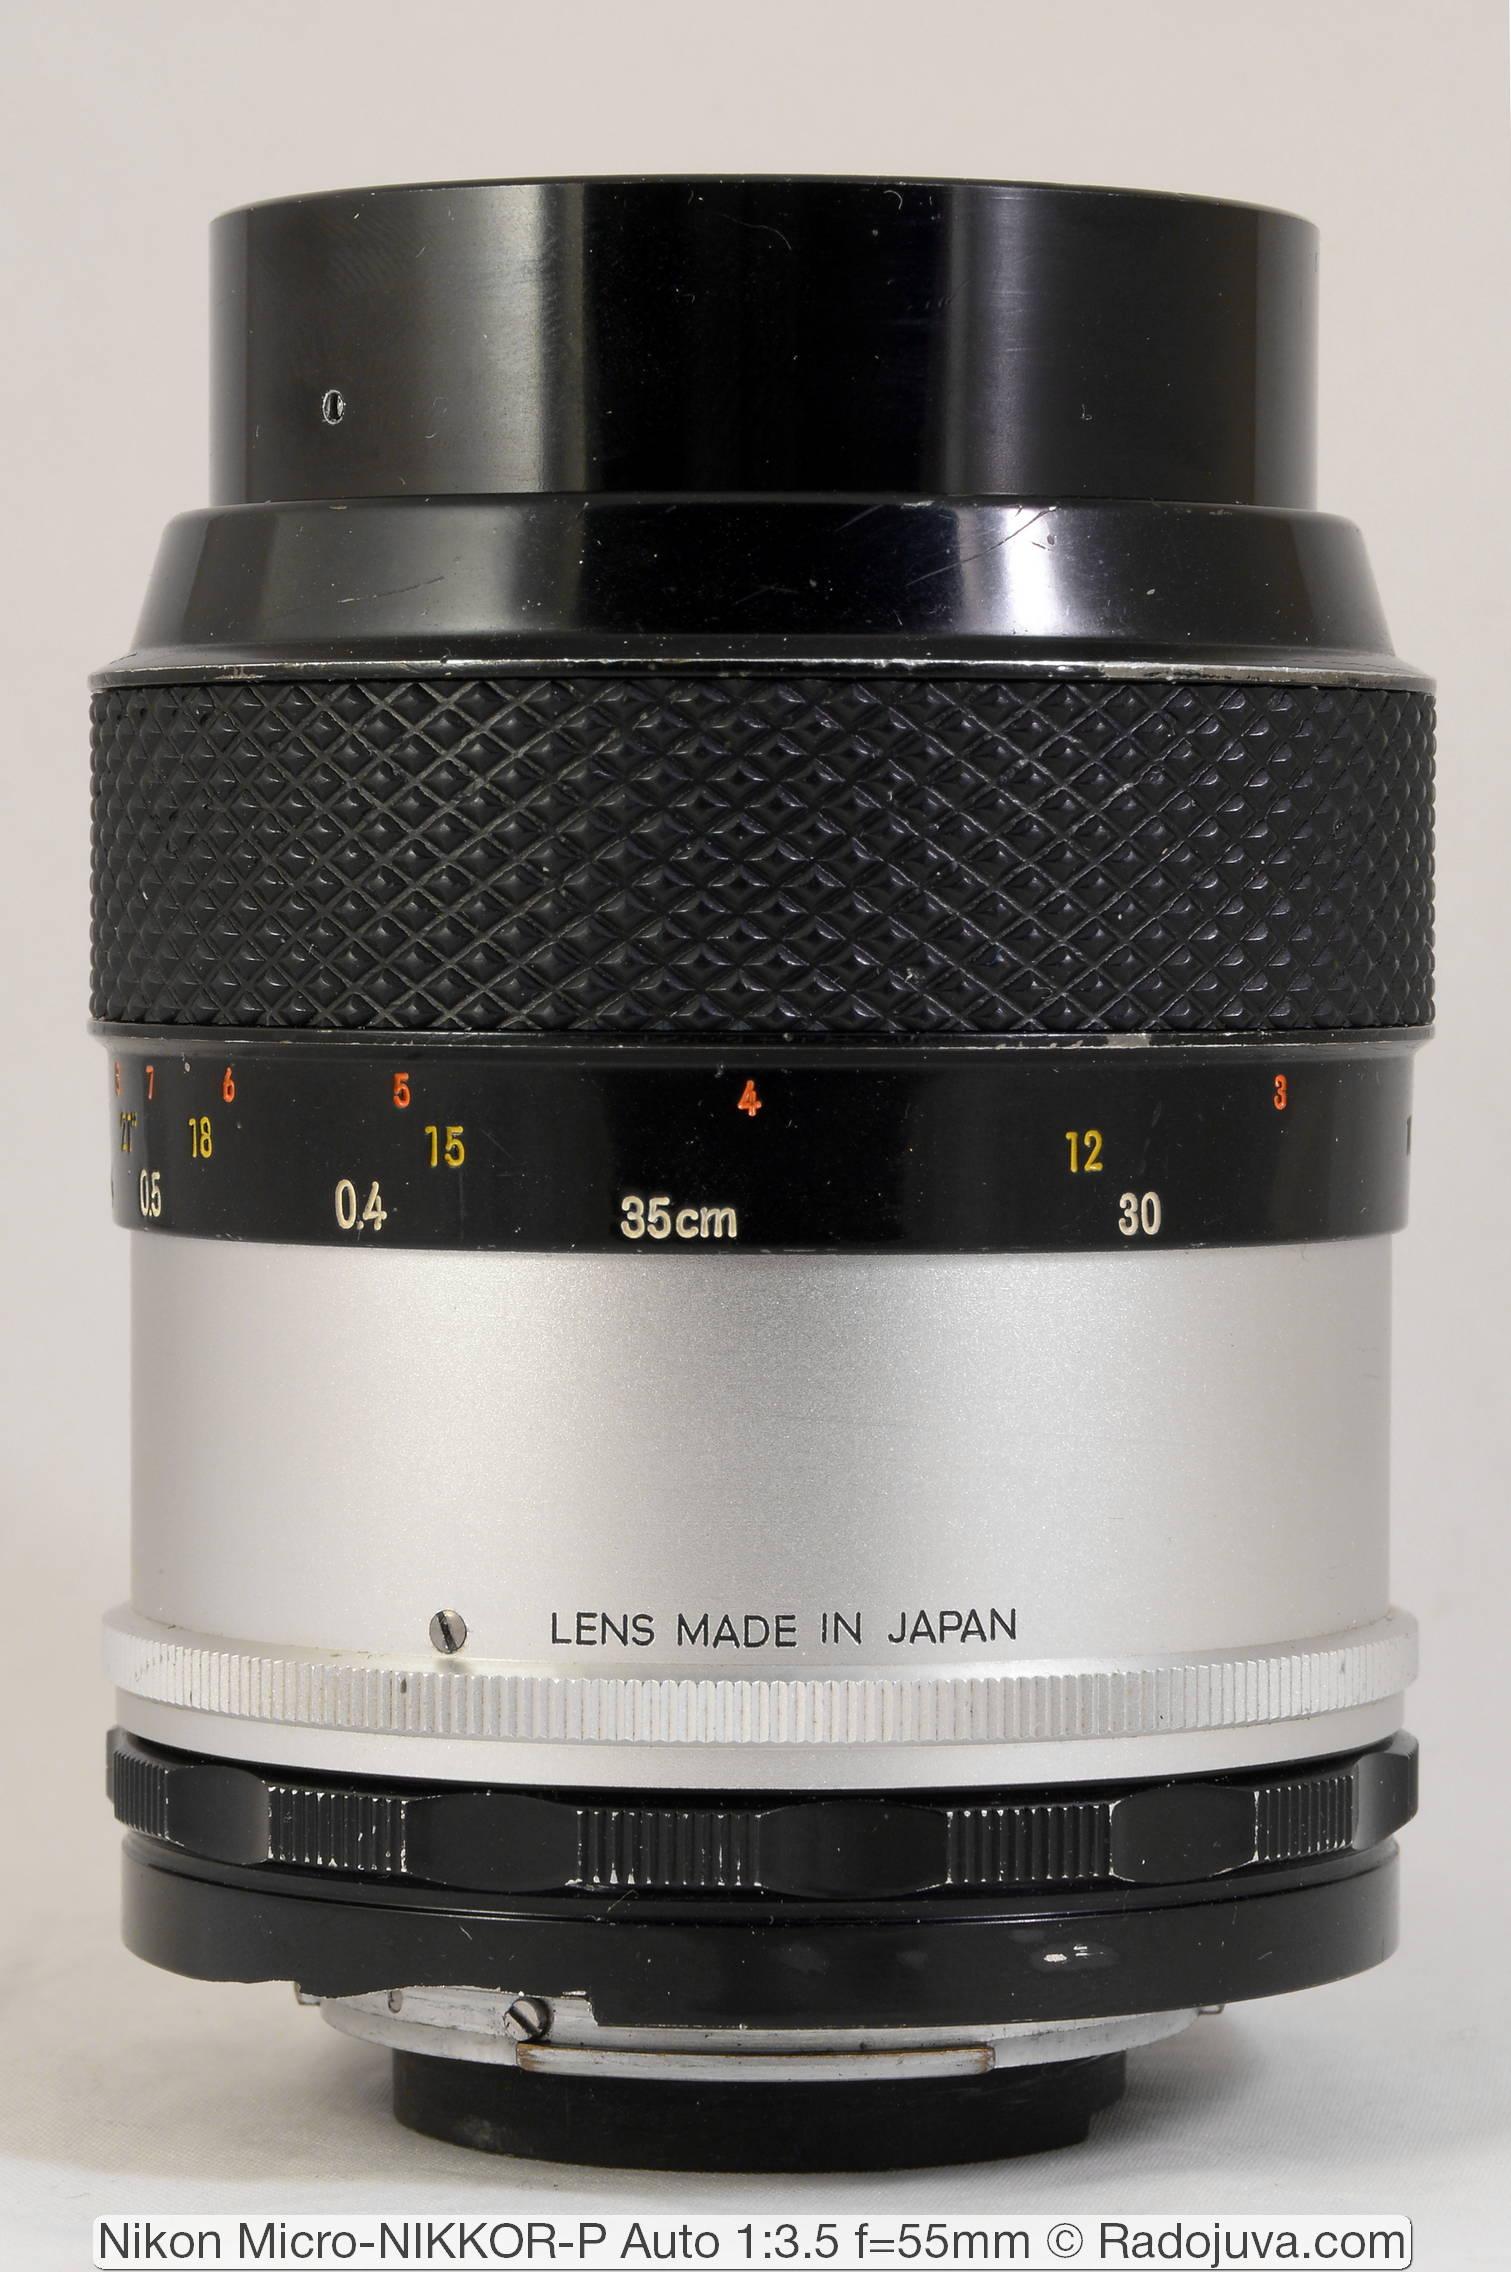 Nikon Micro-NIKKOR-P Auto 1:3.5 f=55mm